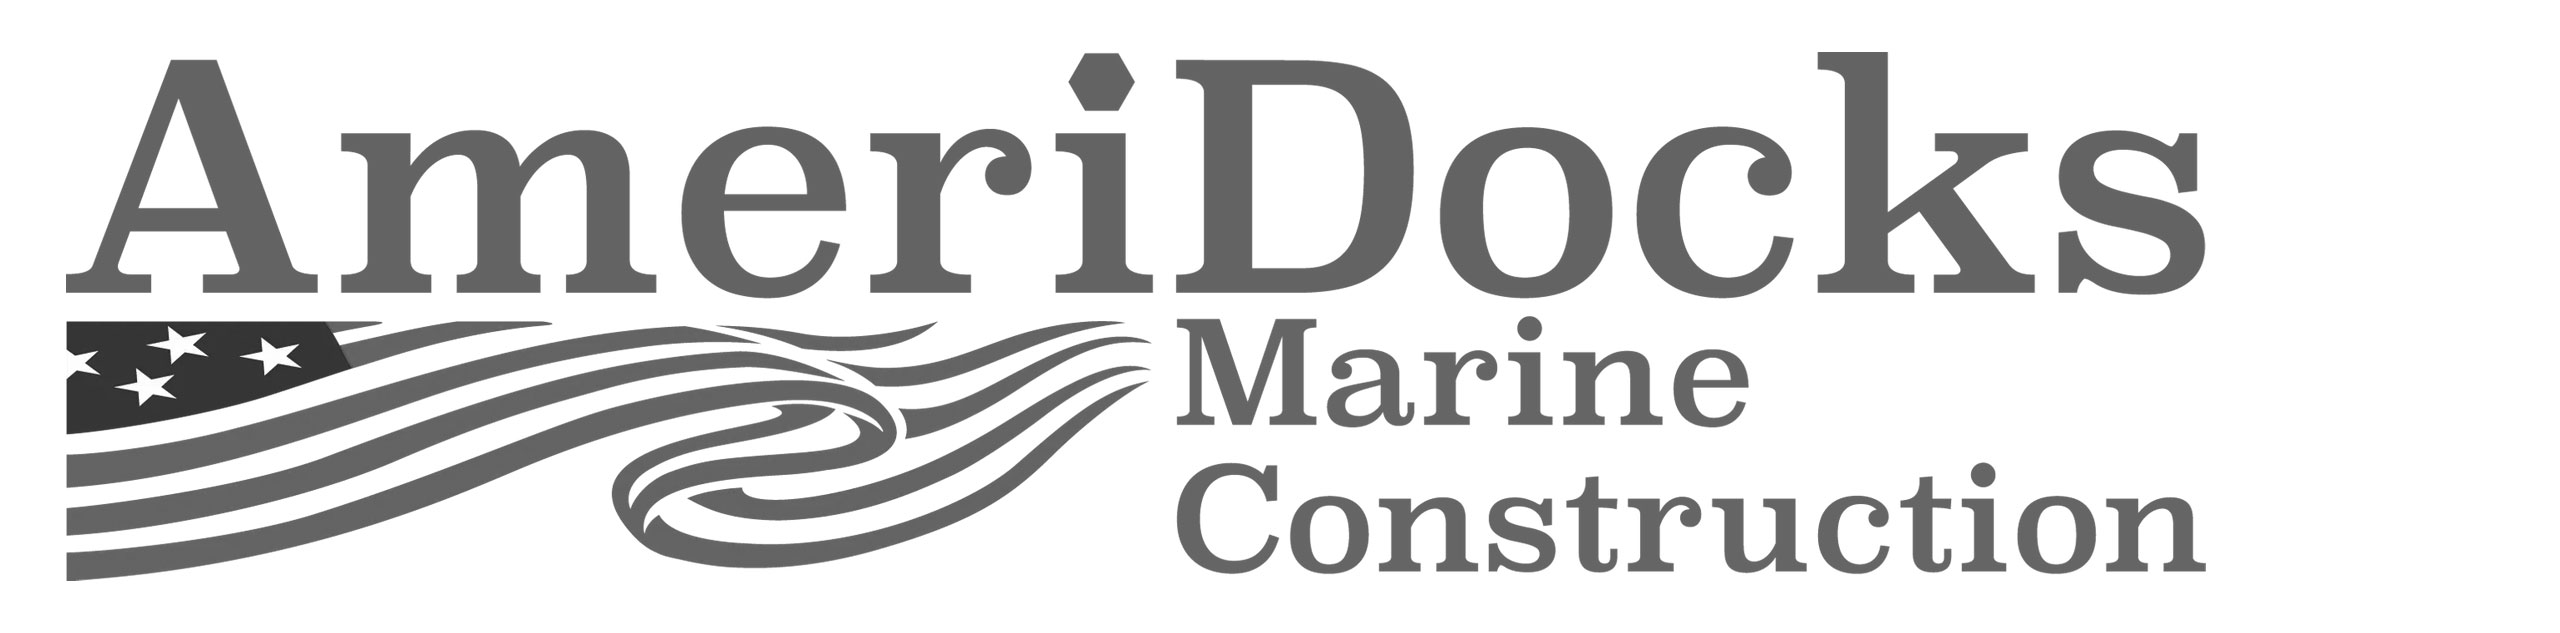 Ameridocks Marine Construction